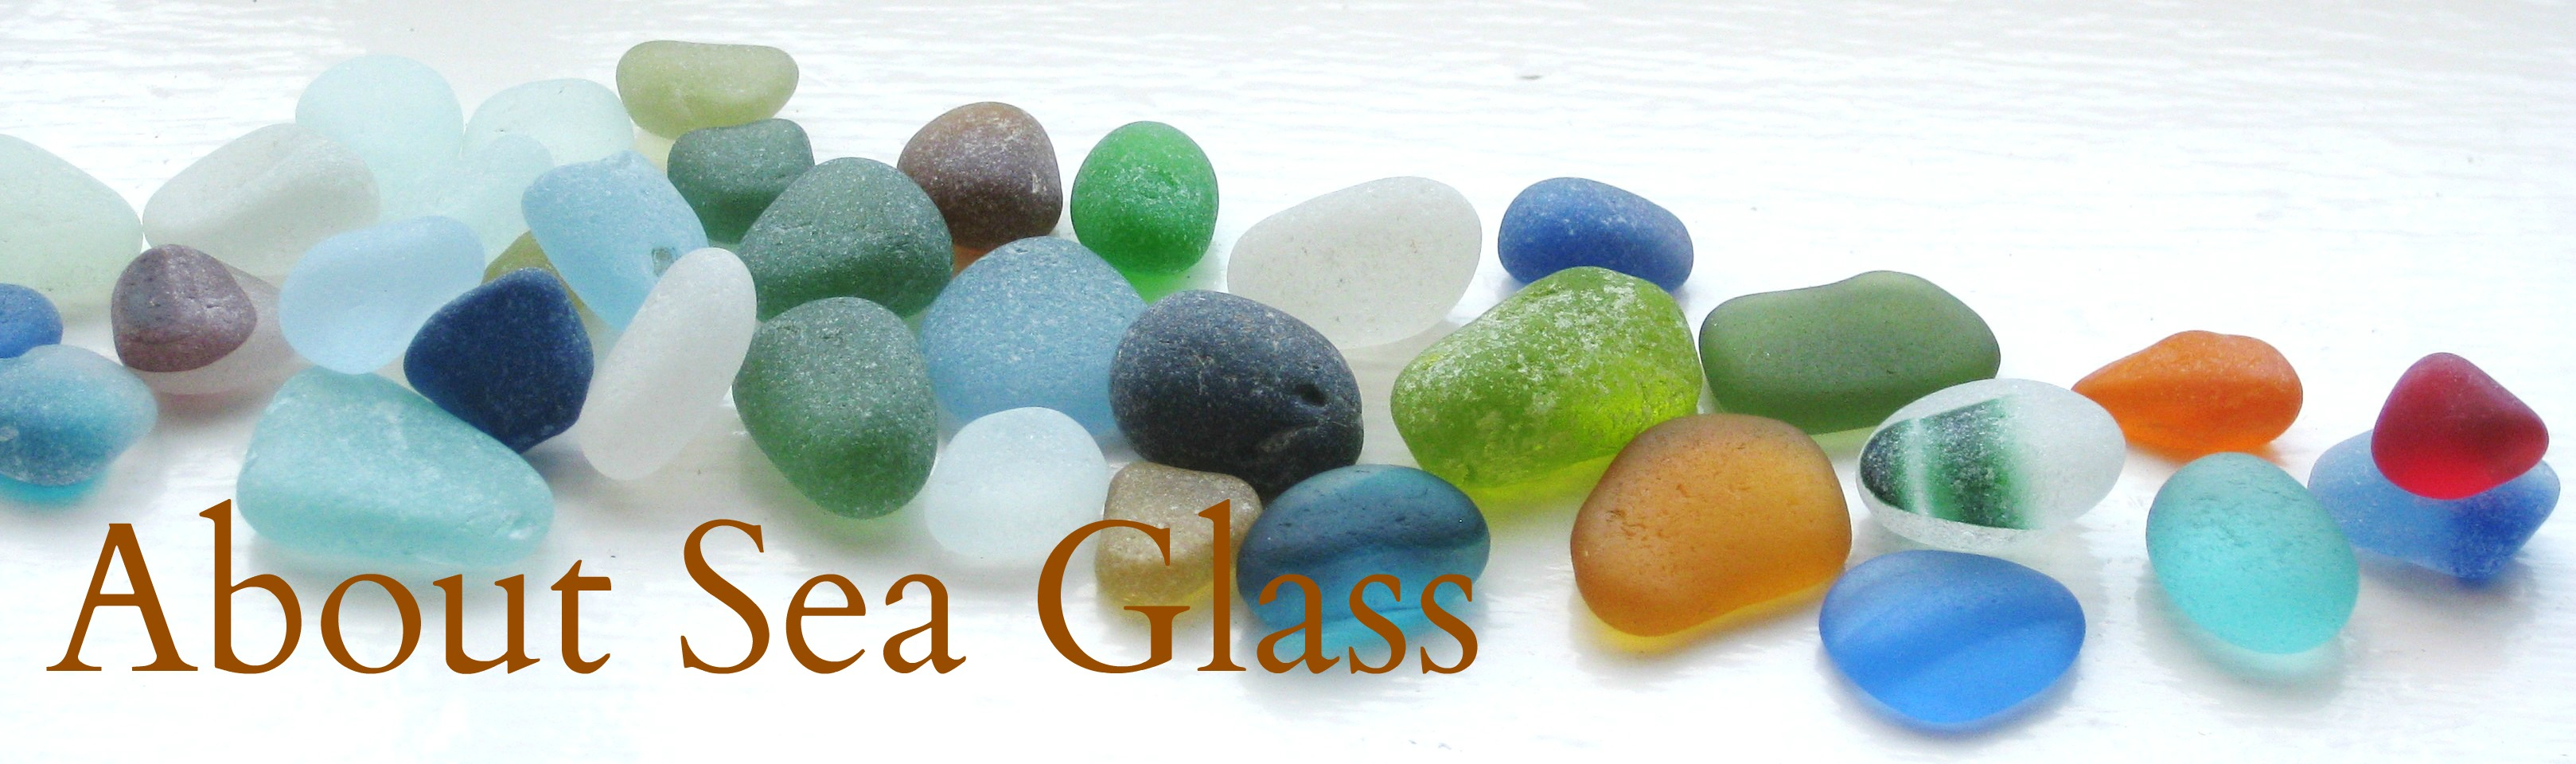 lita-sea-glass-jewelry-about-sea-glass.jpg